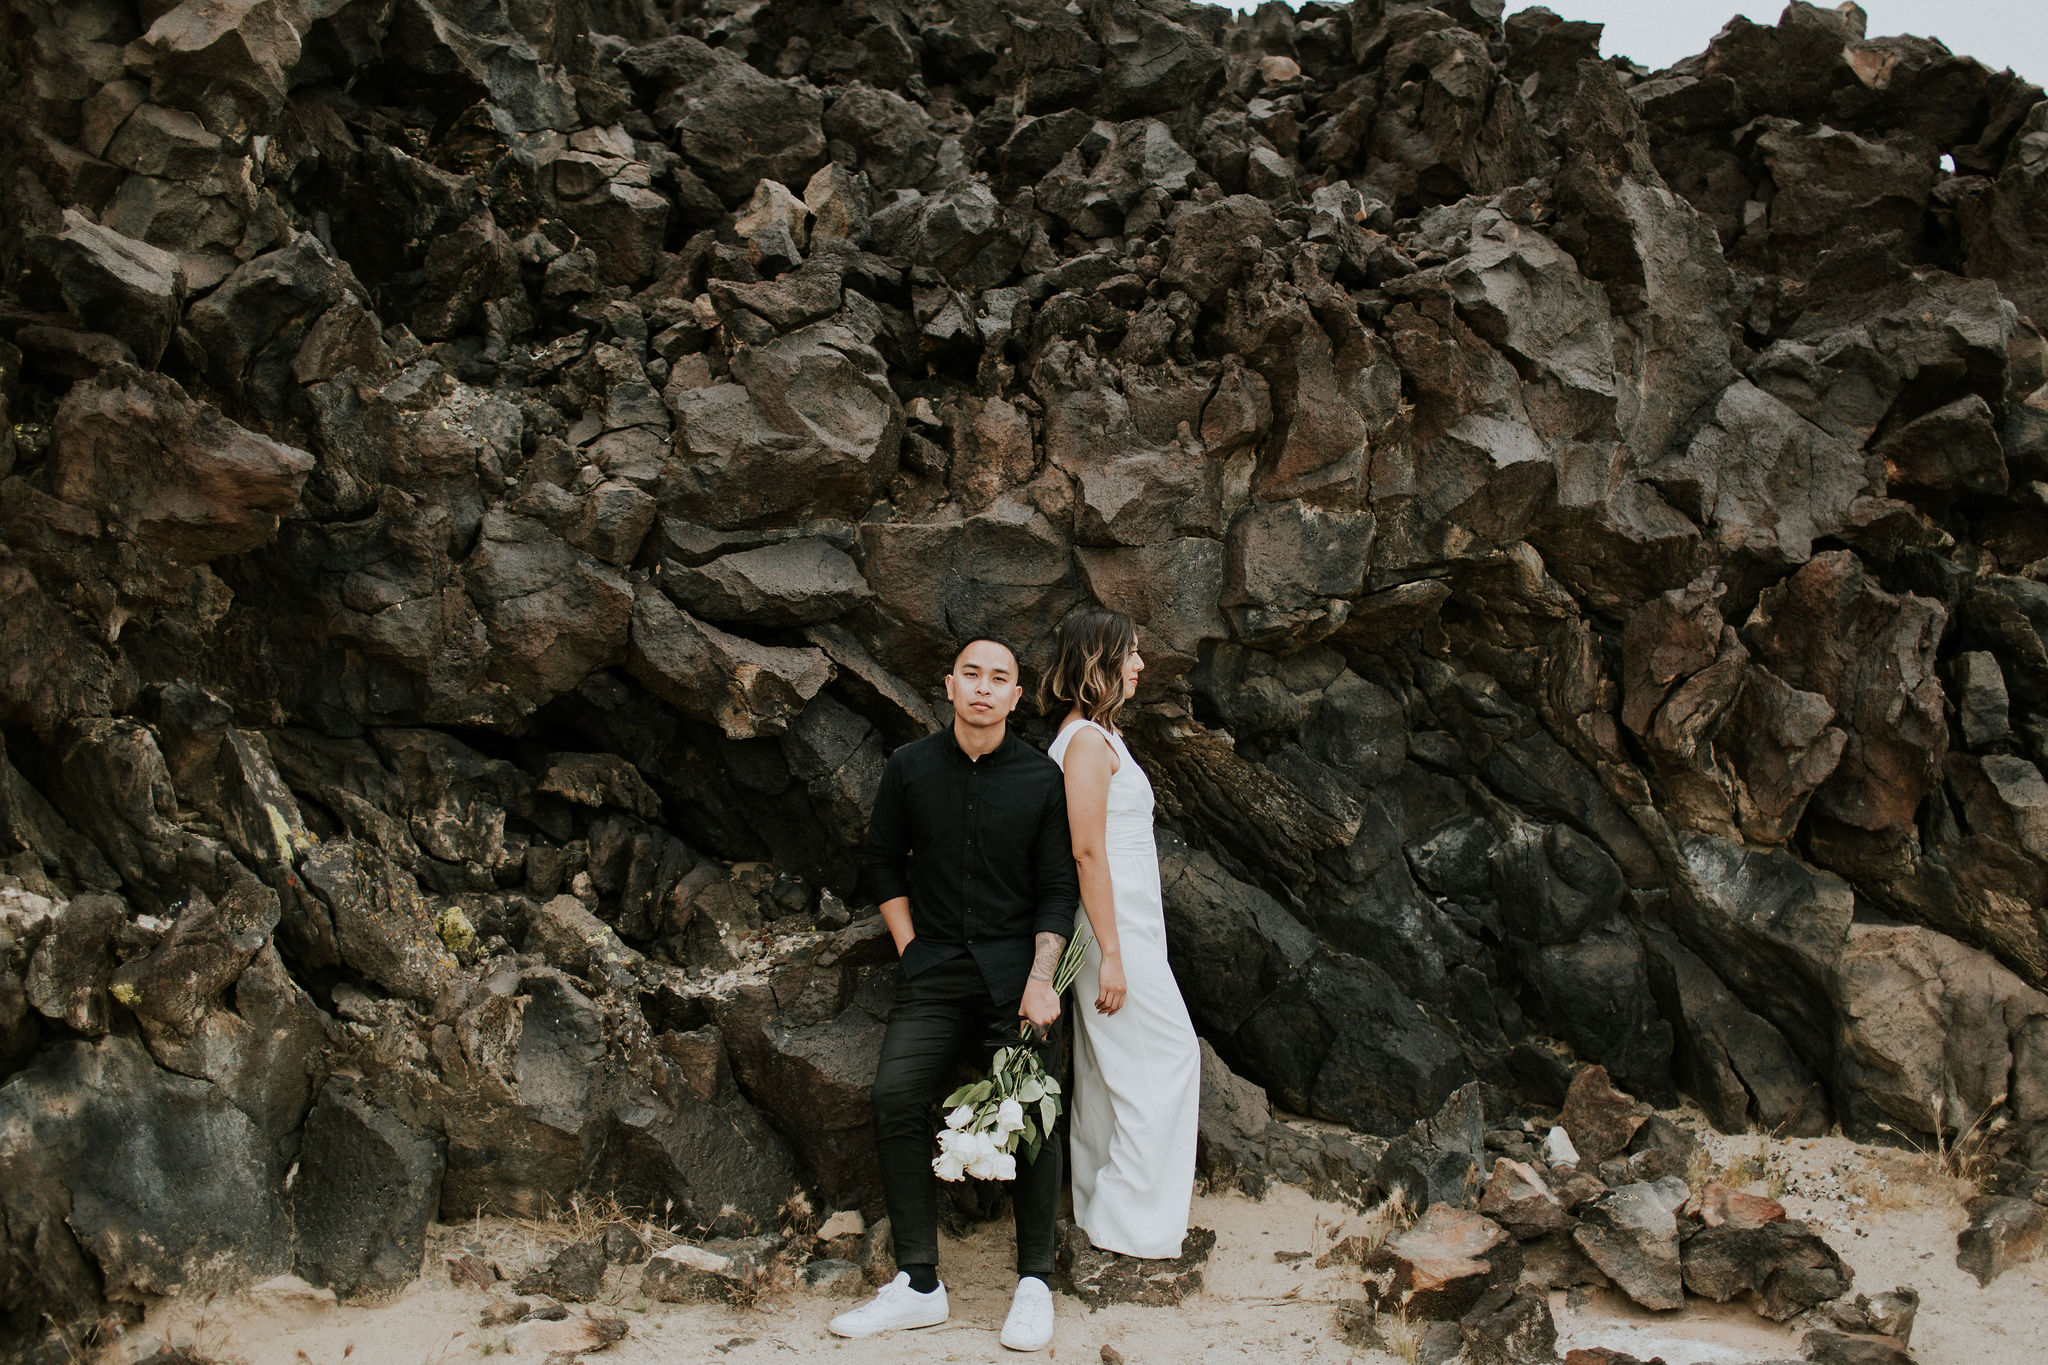 jamilaree-desert-engagementsession-16.jpg